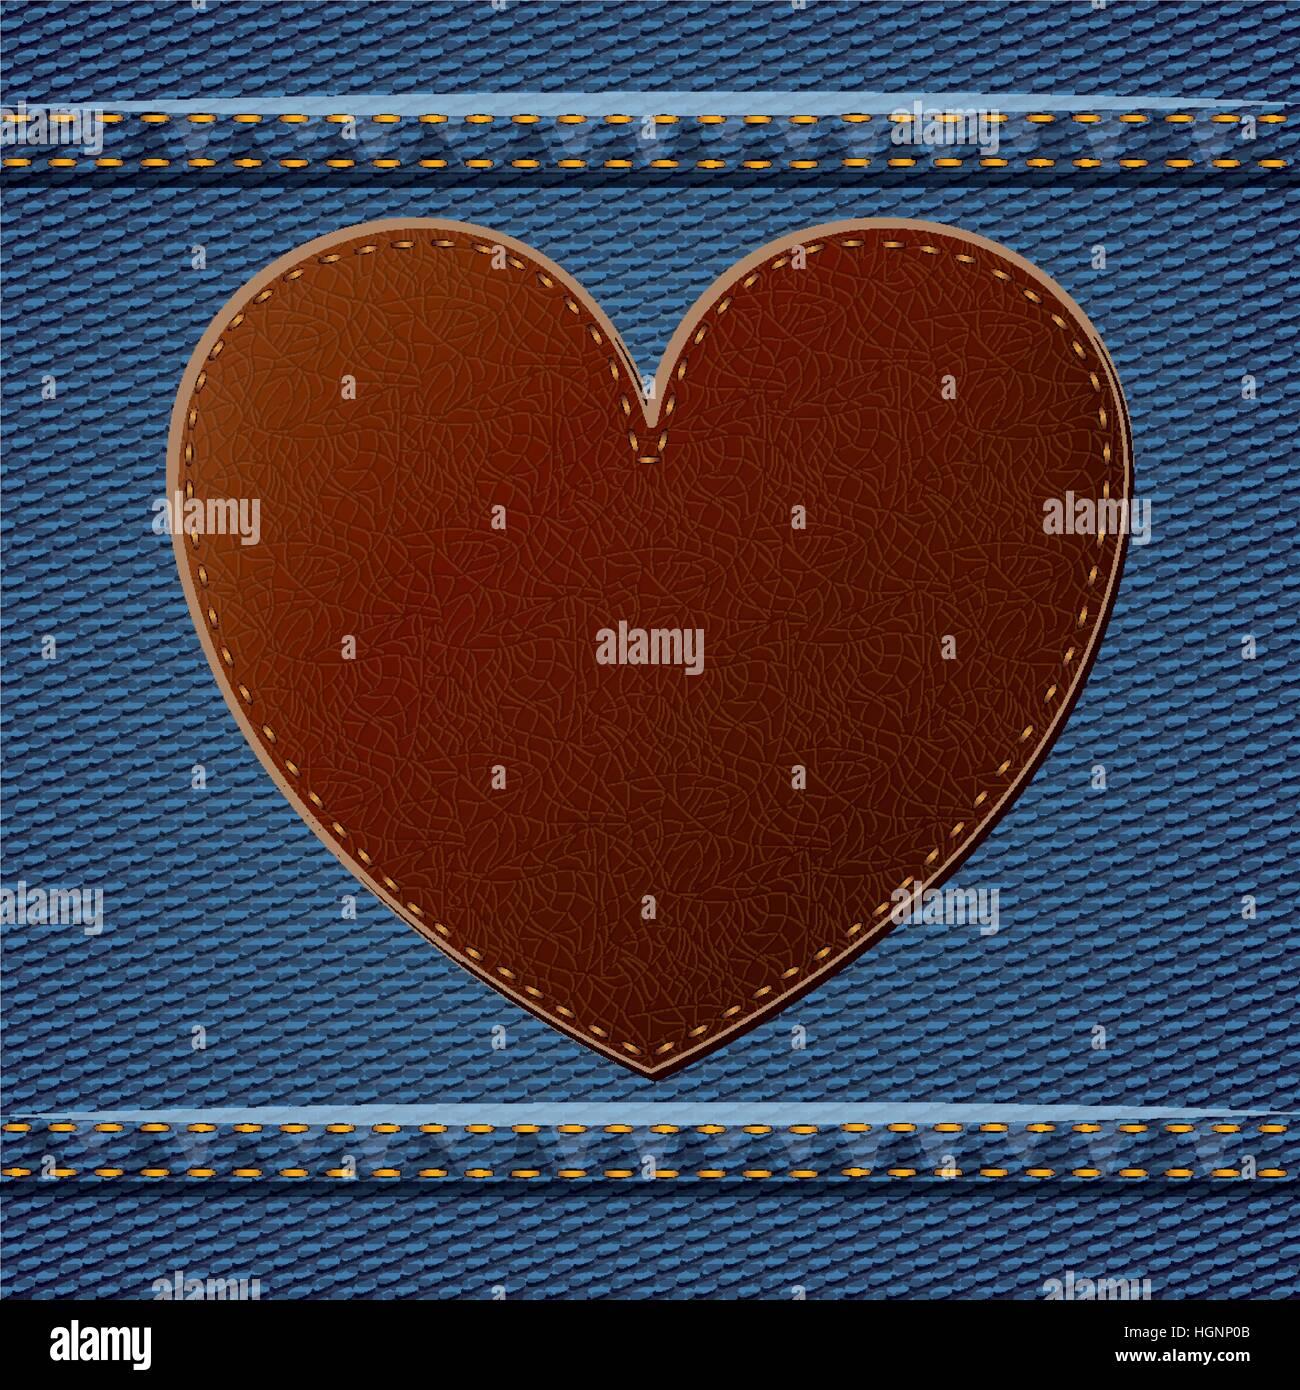 Denim Frame Heart Icon Jeans Stockfotos & Denim Frame Heart Icon ...